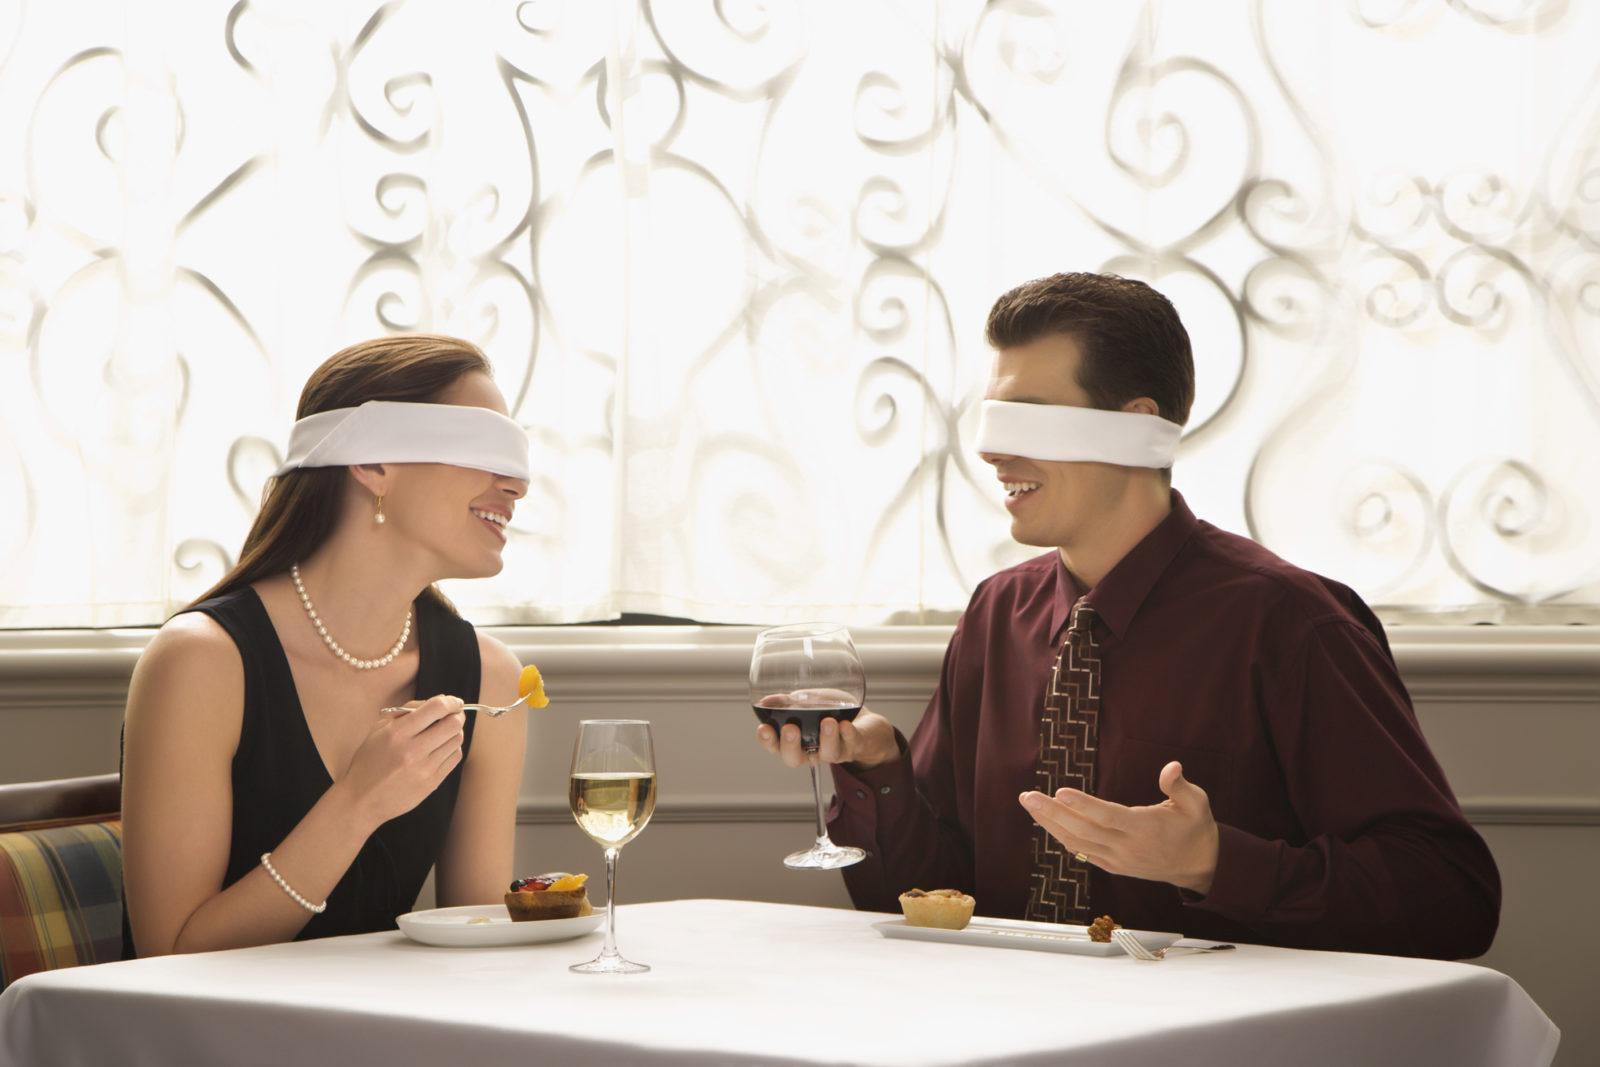 Blind Restaurant theme for events